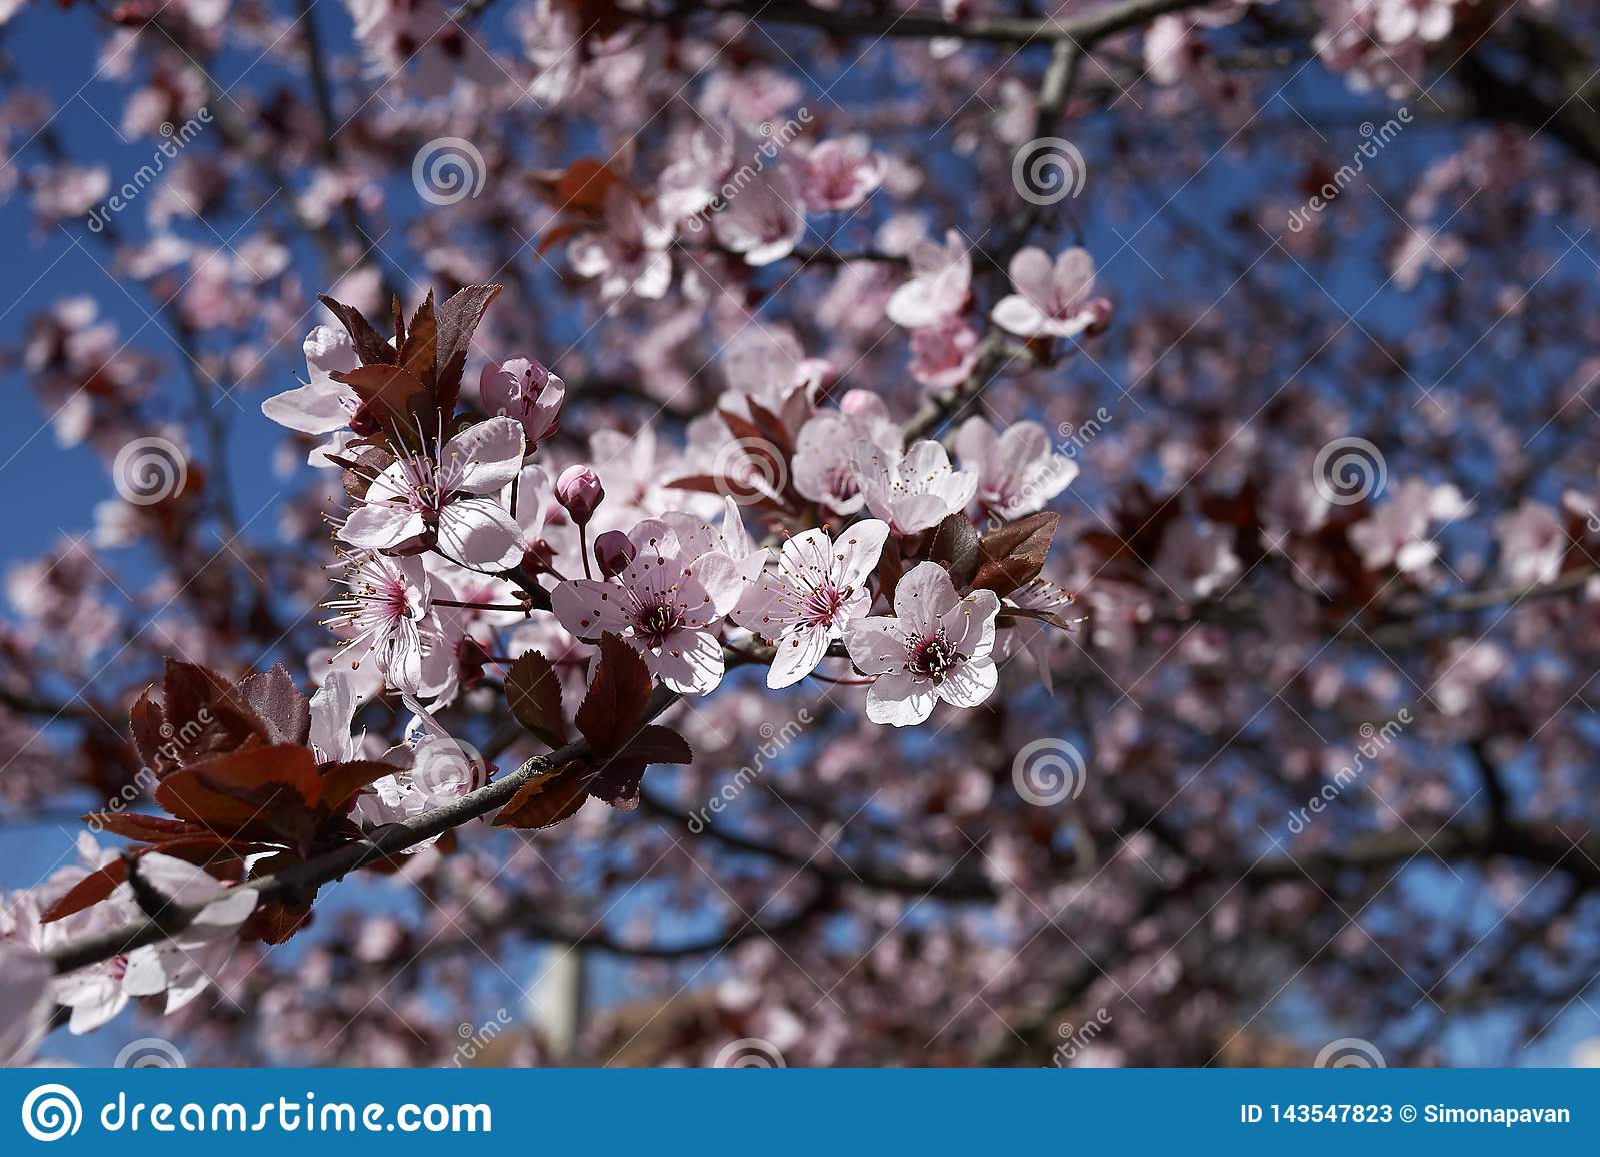 Prunus cerasifera nigra in bloom